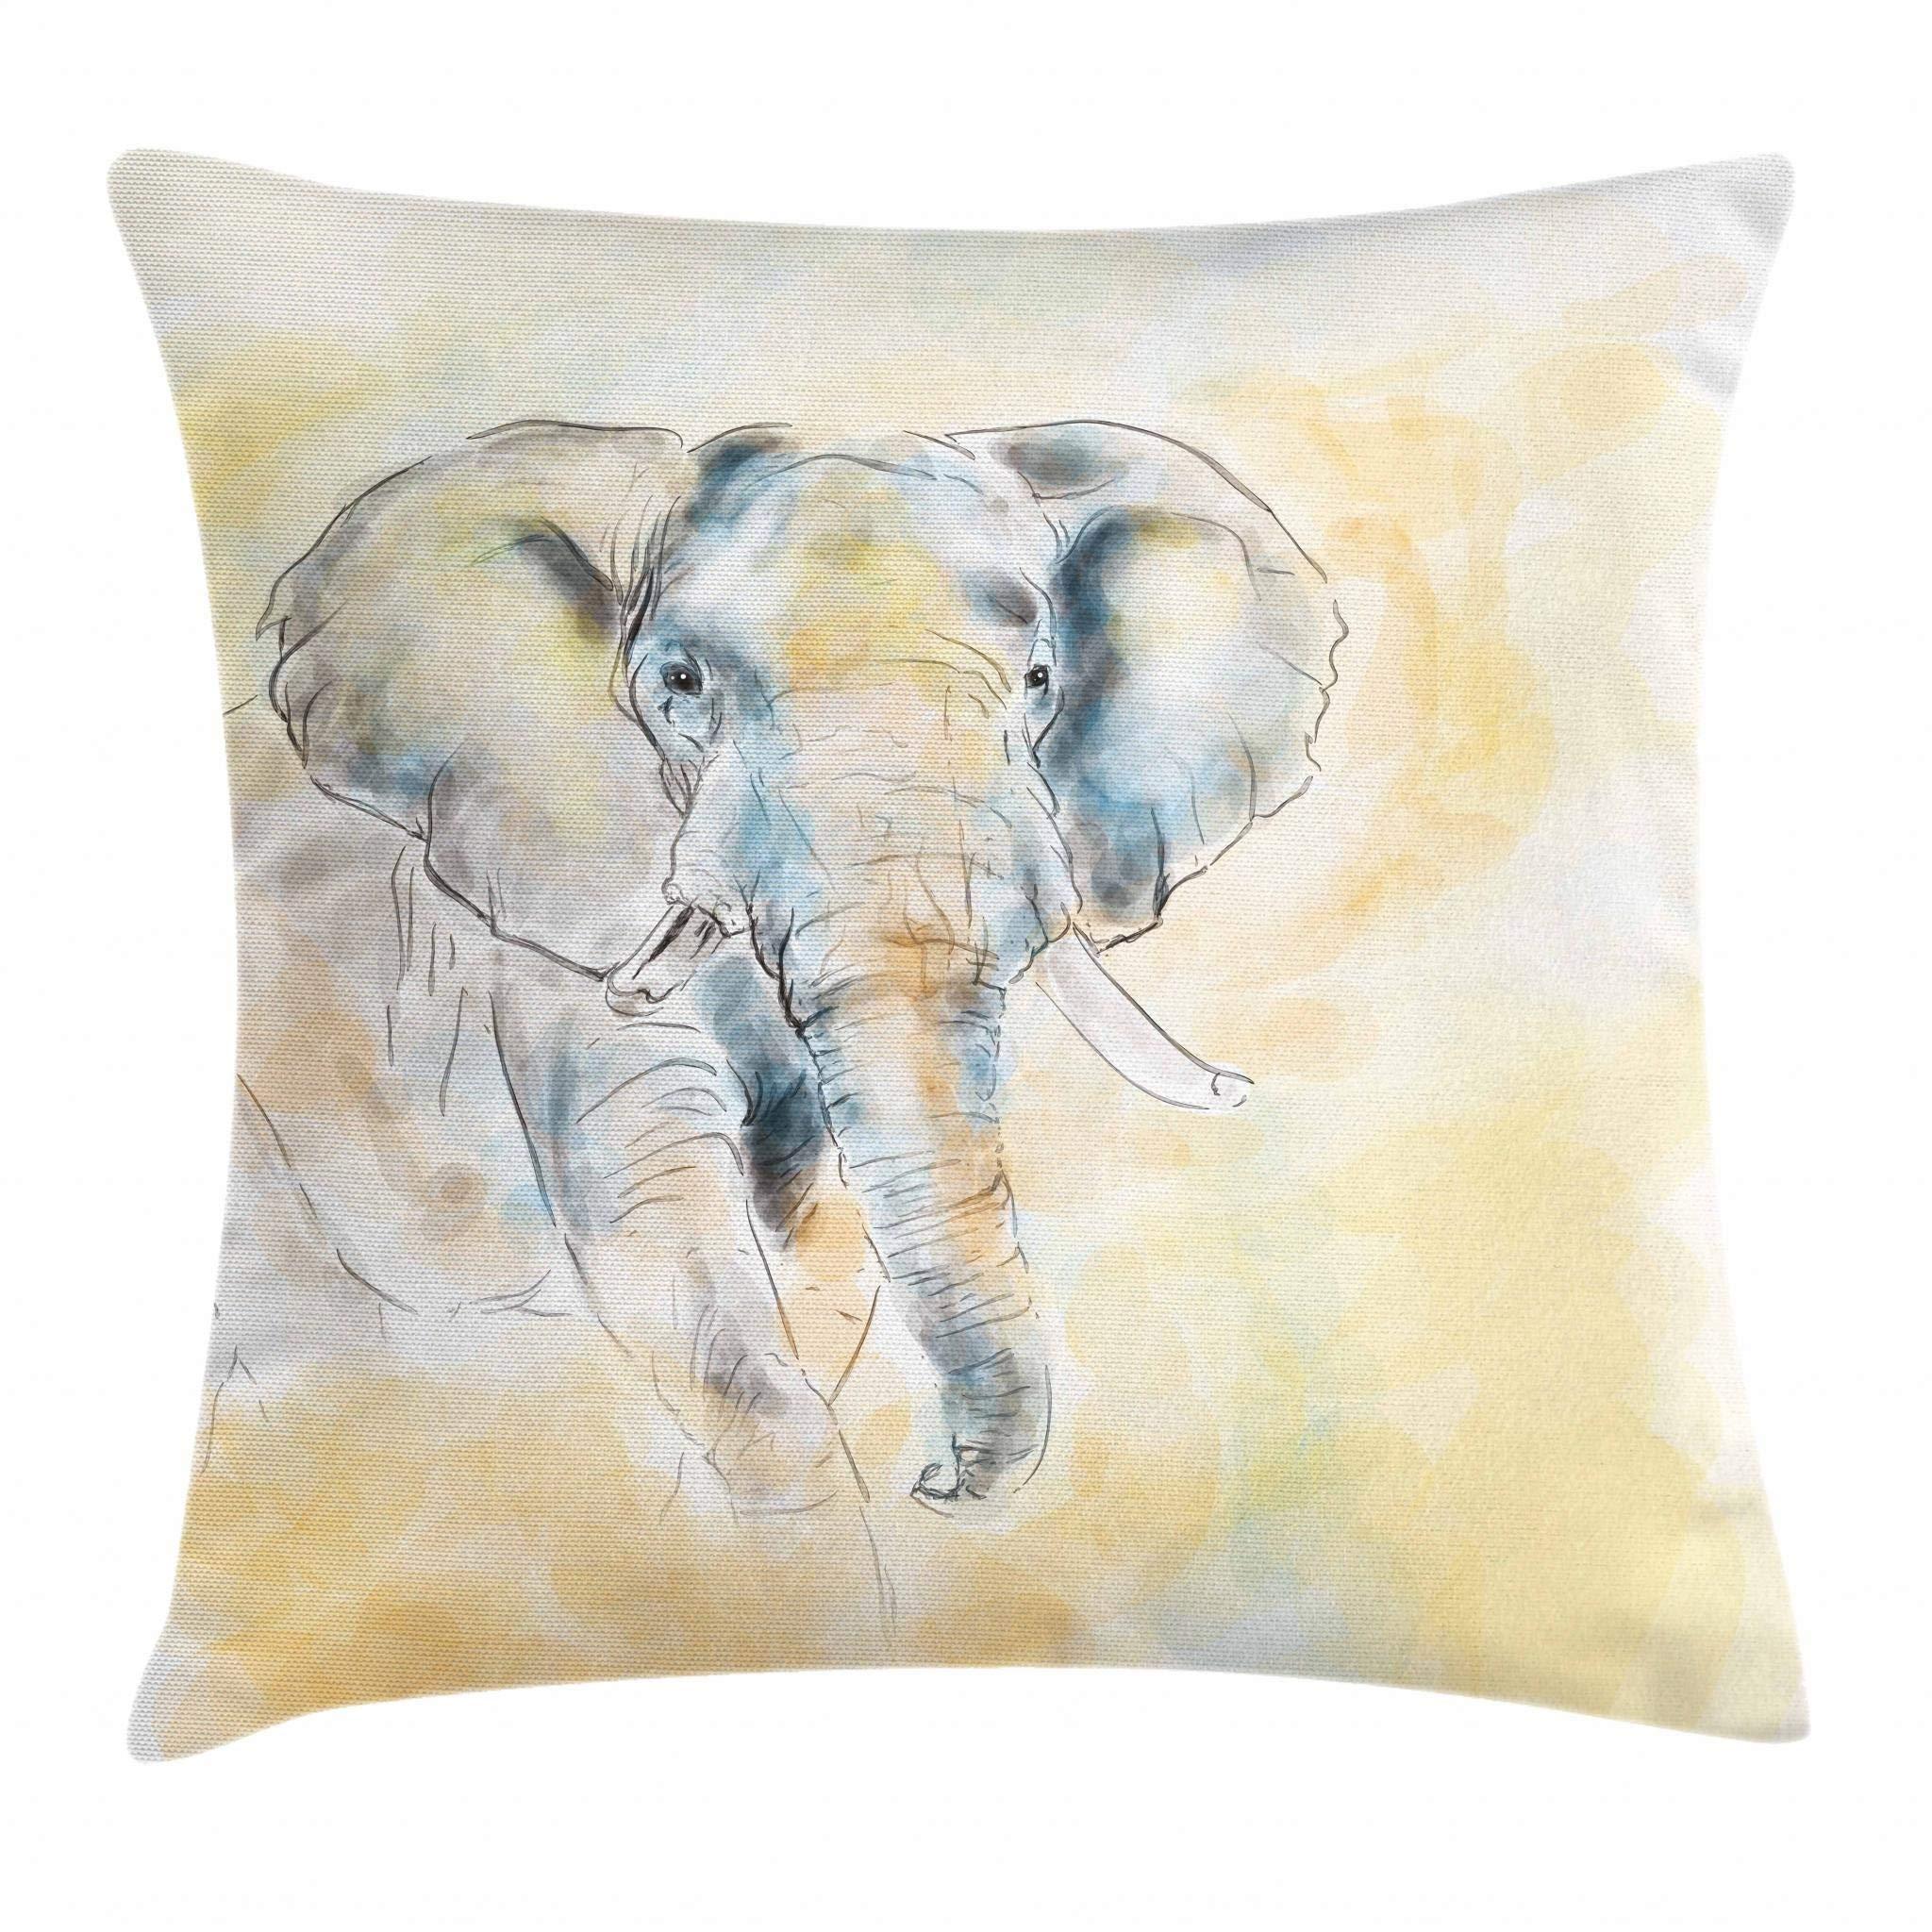 Ambesonne Elephant Throw Pillow Cushion Cover, Elephant Watercolor Style Illustration Wild Creature Safari Exotic Wildlife Theme, Decorative Square Accent Pillow Case, 16'' X 16'', Cream Grey